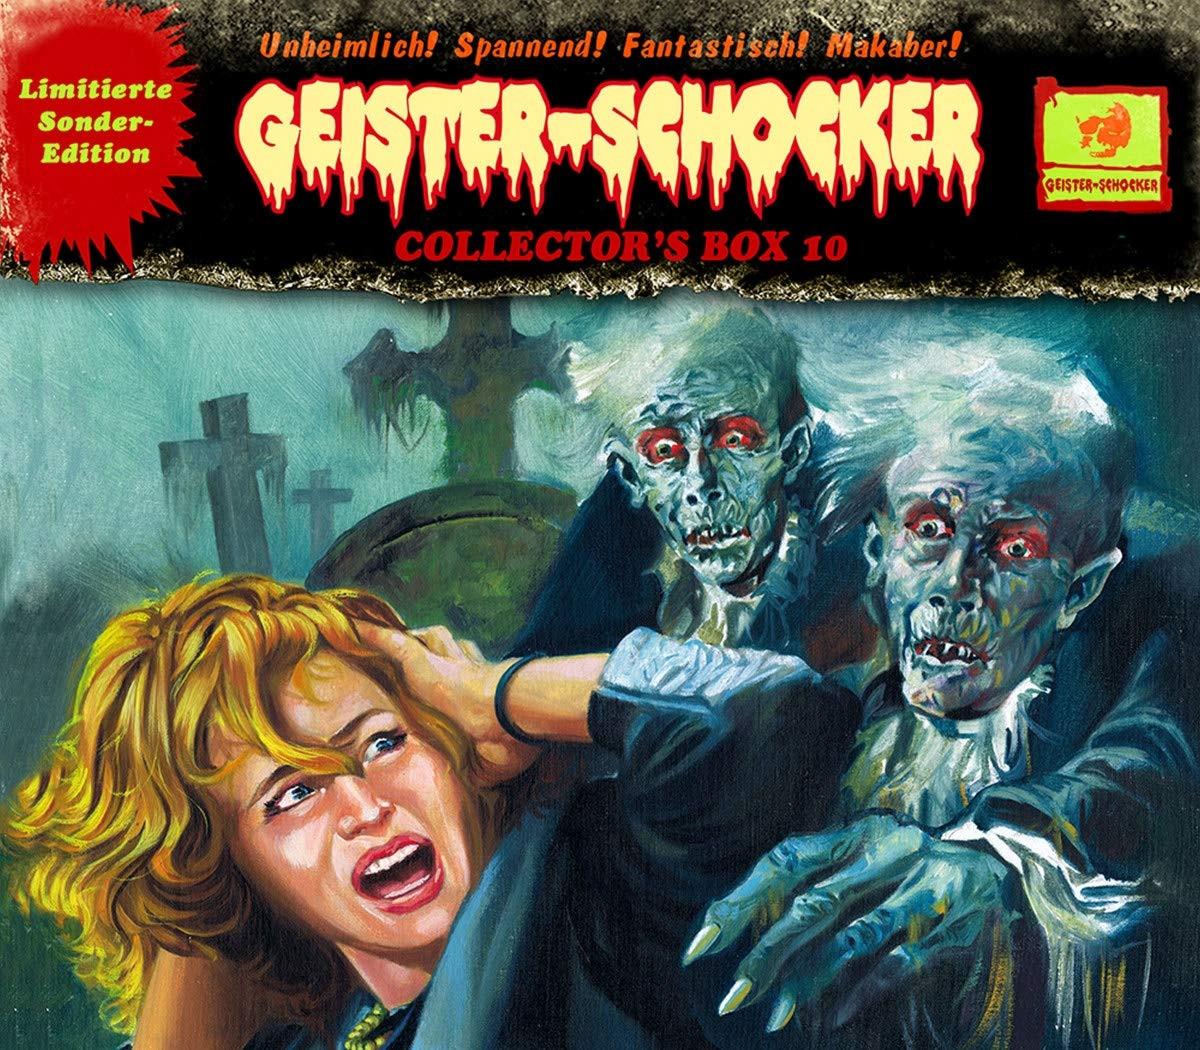 Geister-Schocker Collector's Box 10 (Folge 26-28)